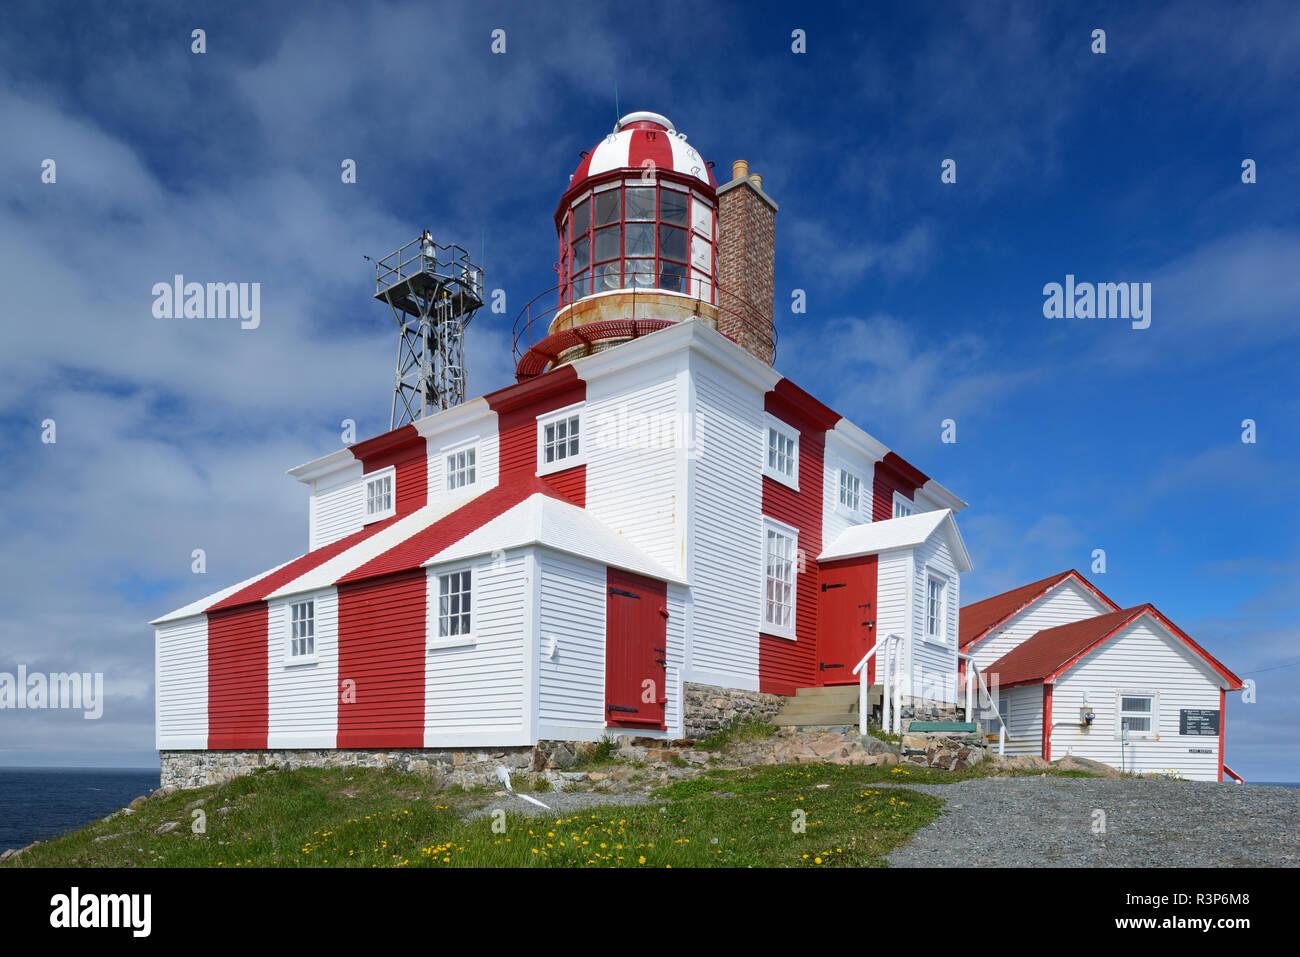 Canada, Newfoundland. Cape Bonavista Lighthouse. - Stock Image